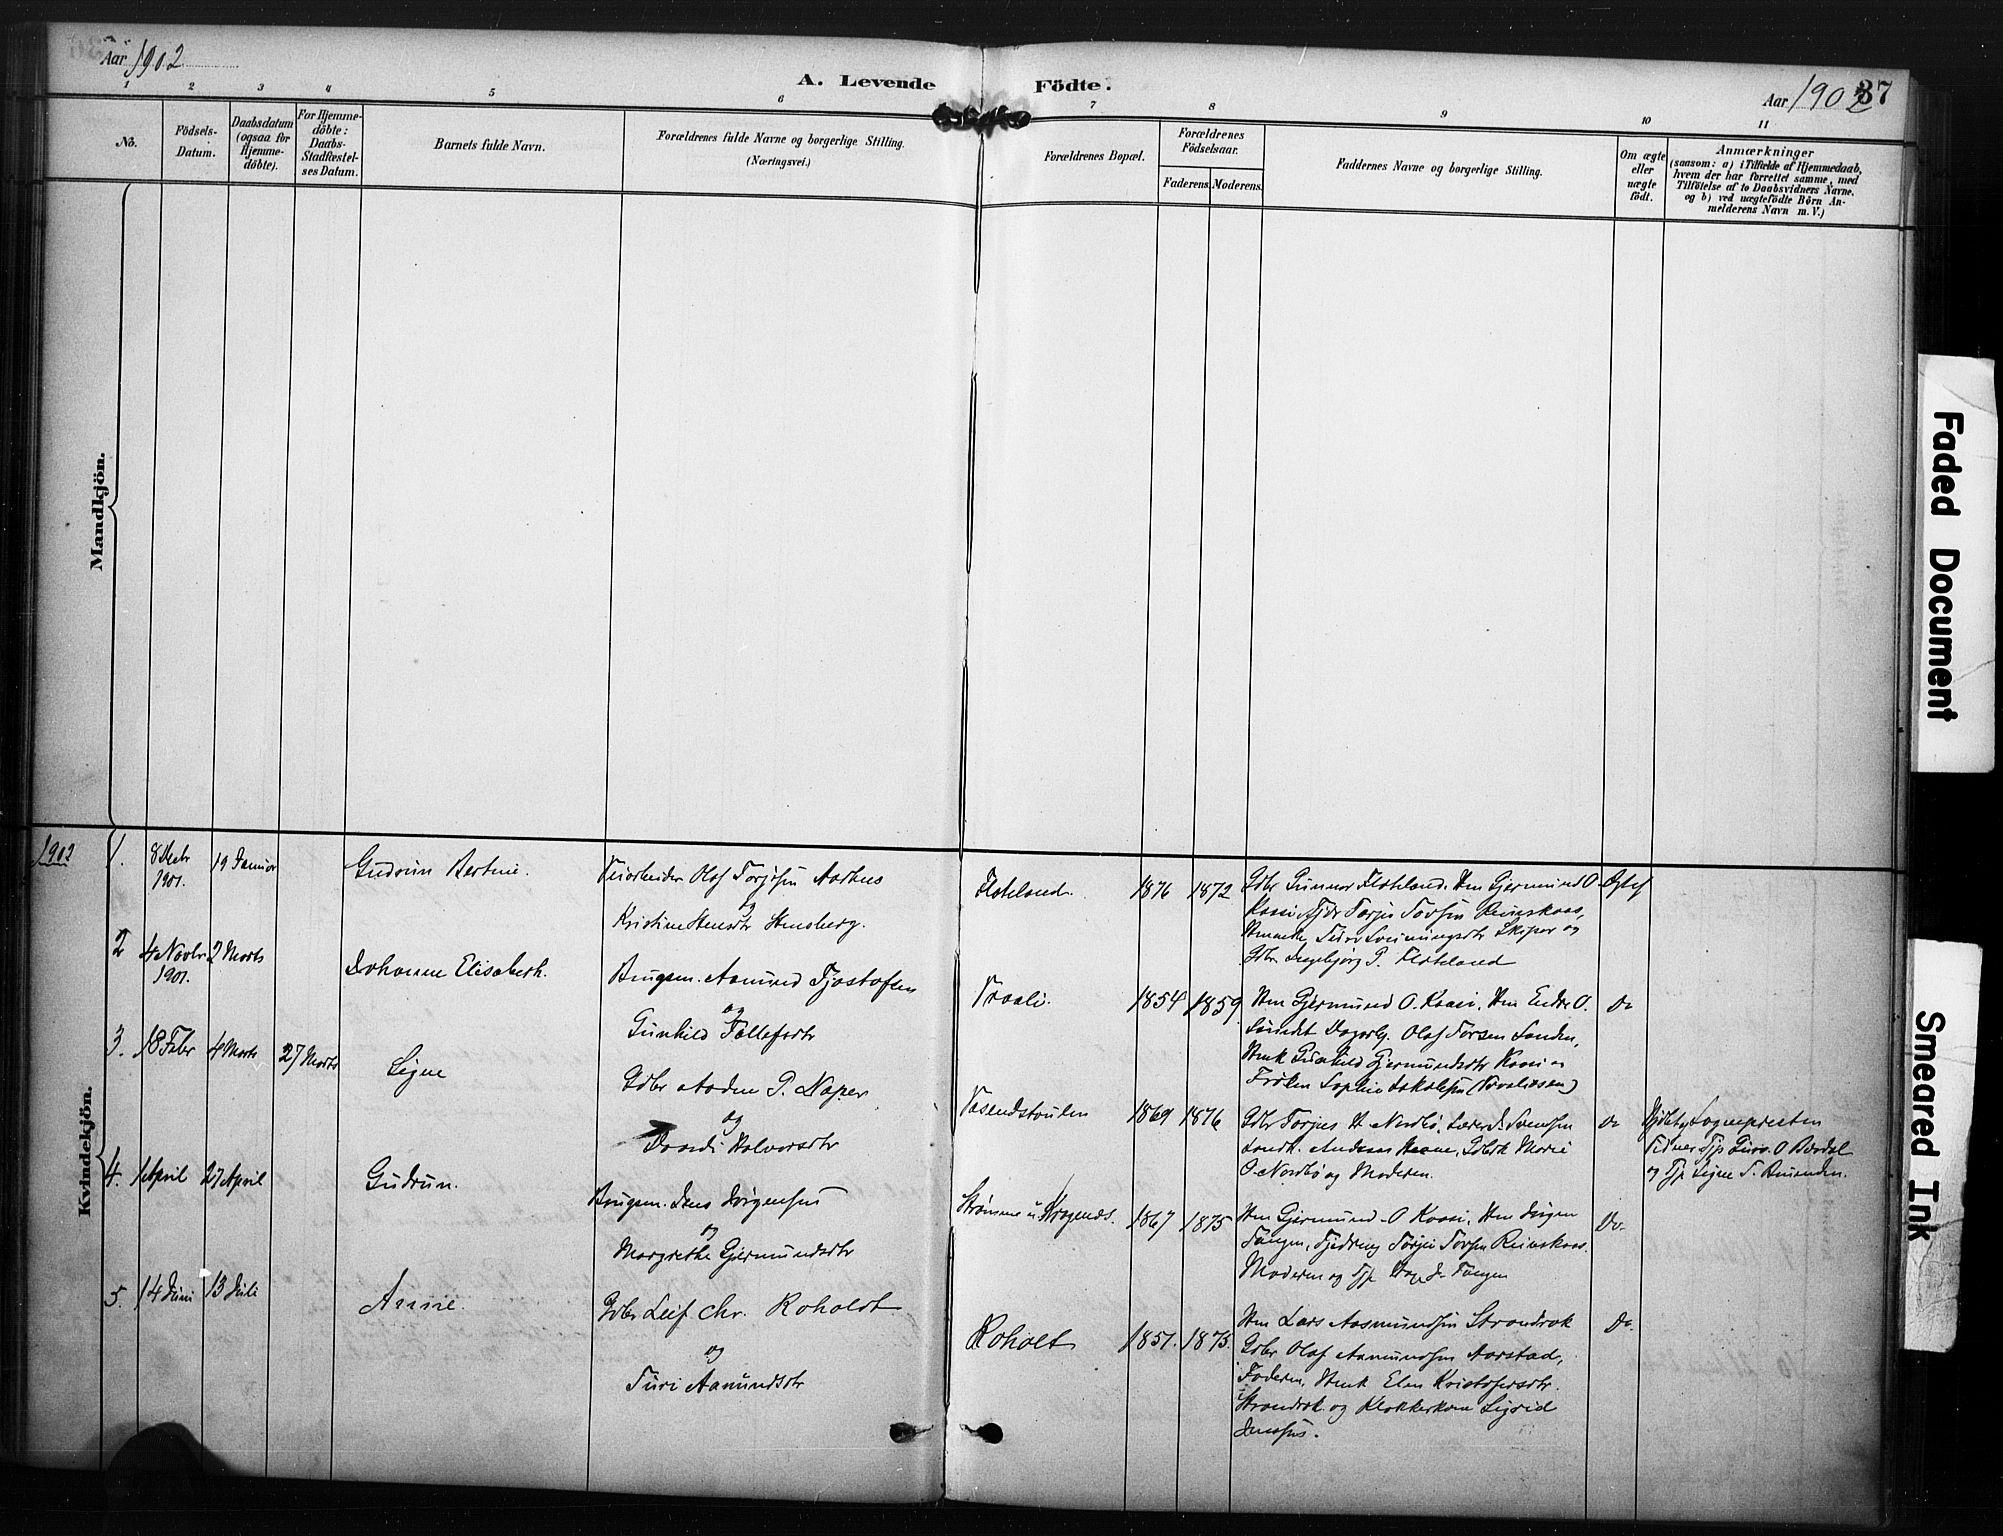 SAKO, Kviteseid kirkebøker, F/Fc/L0002: Ministerialbok nr. III 2, 1882-1908, s. 37